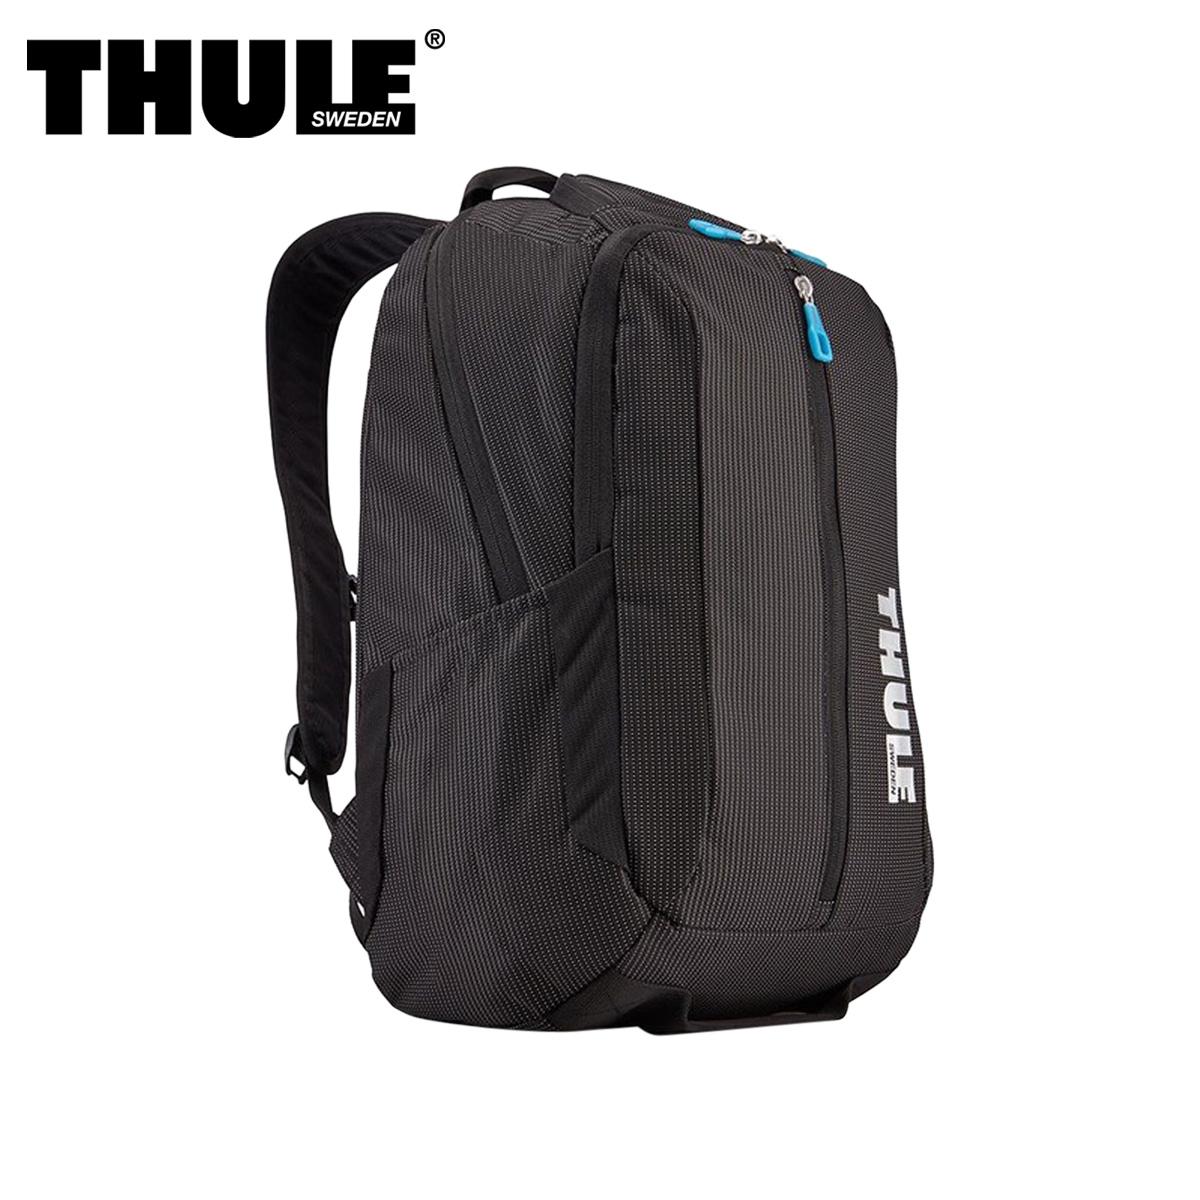 THULE CROSSOVER BACKPACK スーリー リュック バッグ バックパック クロスオーバー メンズ レディース 25L ブラック 黒 3201989